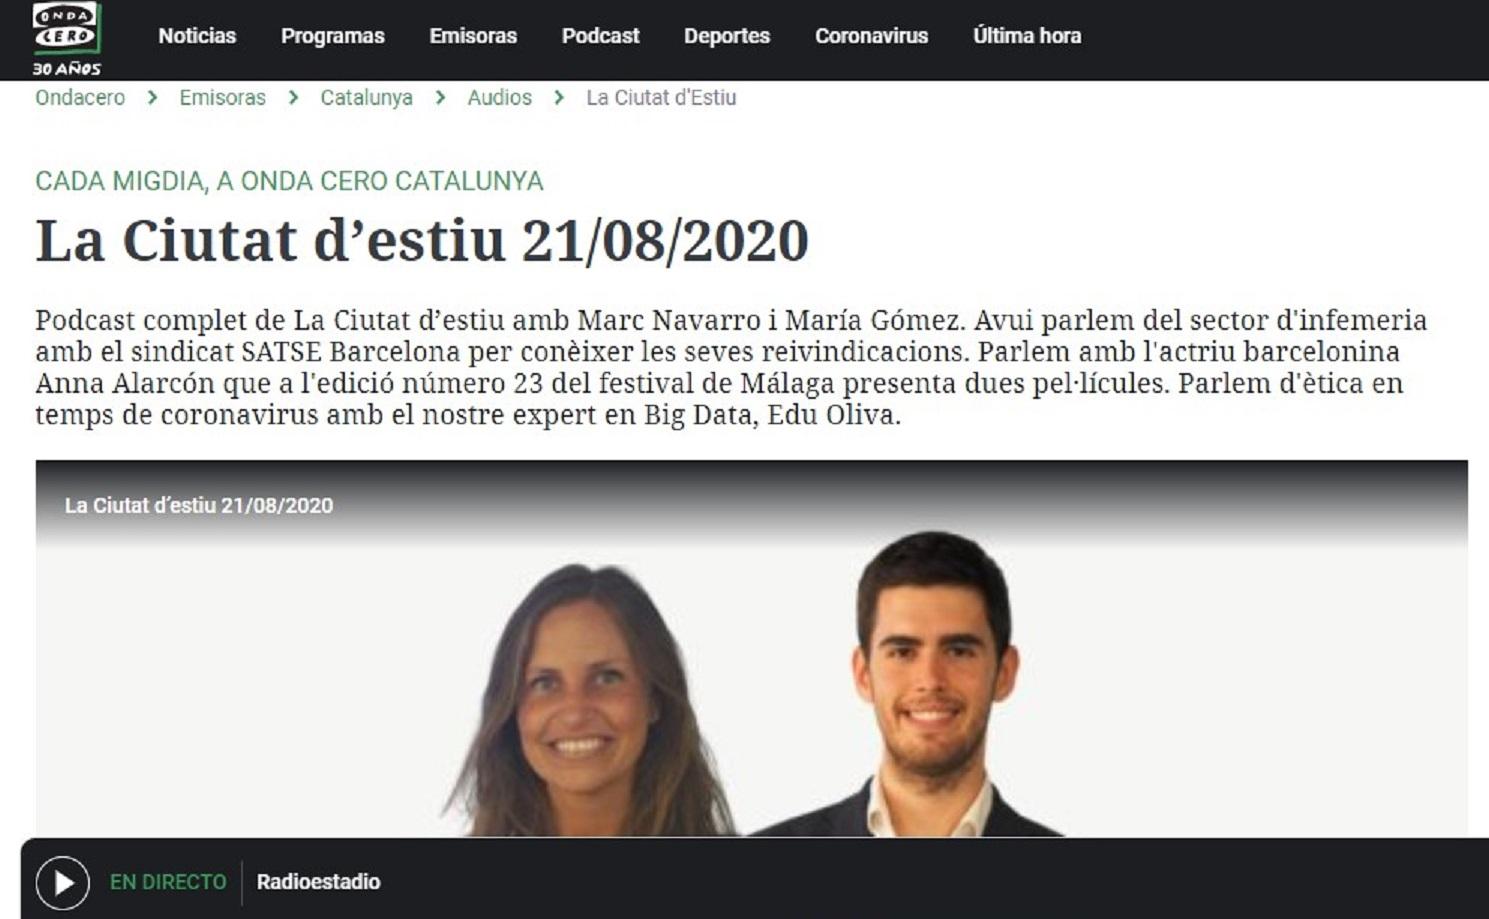 "MicroSensacions Teatrals en ""La ciutat d'estiu"" de Onda Cero en el minuto 14' 07"" - 21/08/2020 gabinete de prensa"